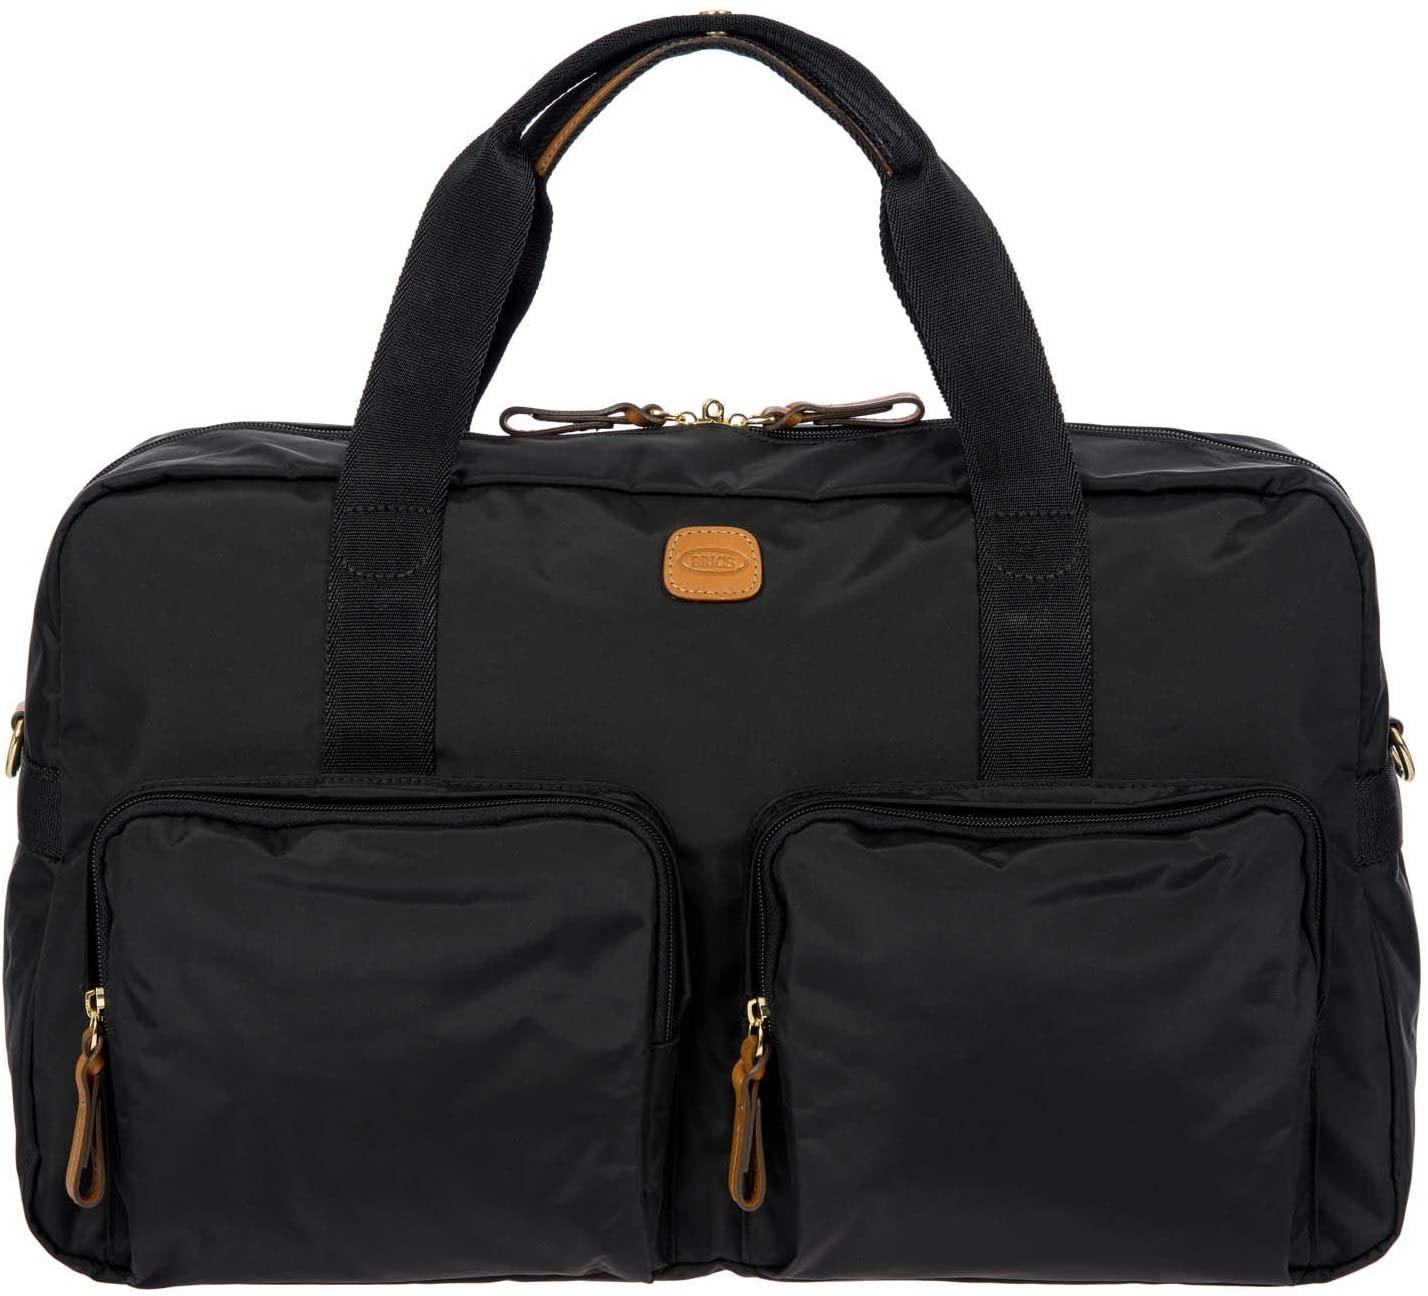 Bric's USA Luggage Model: X-BAG/X-TRAVEL |Size: 18